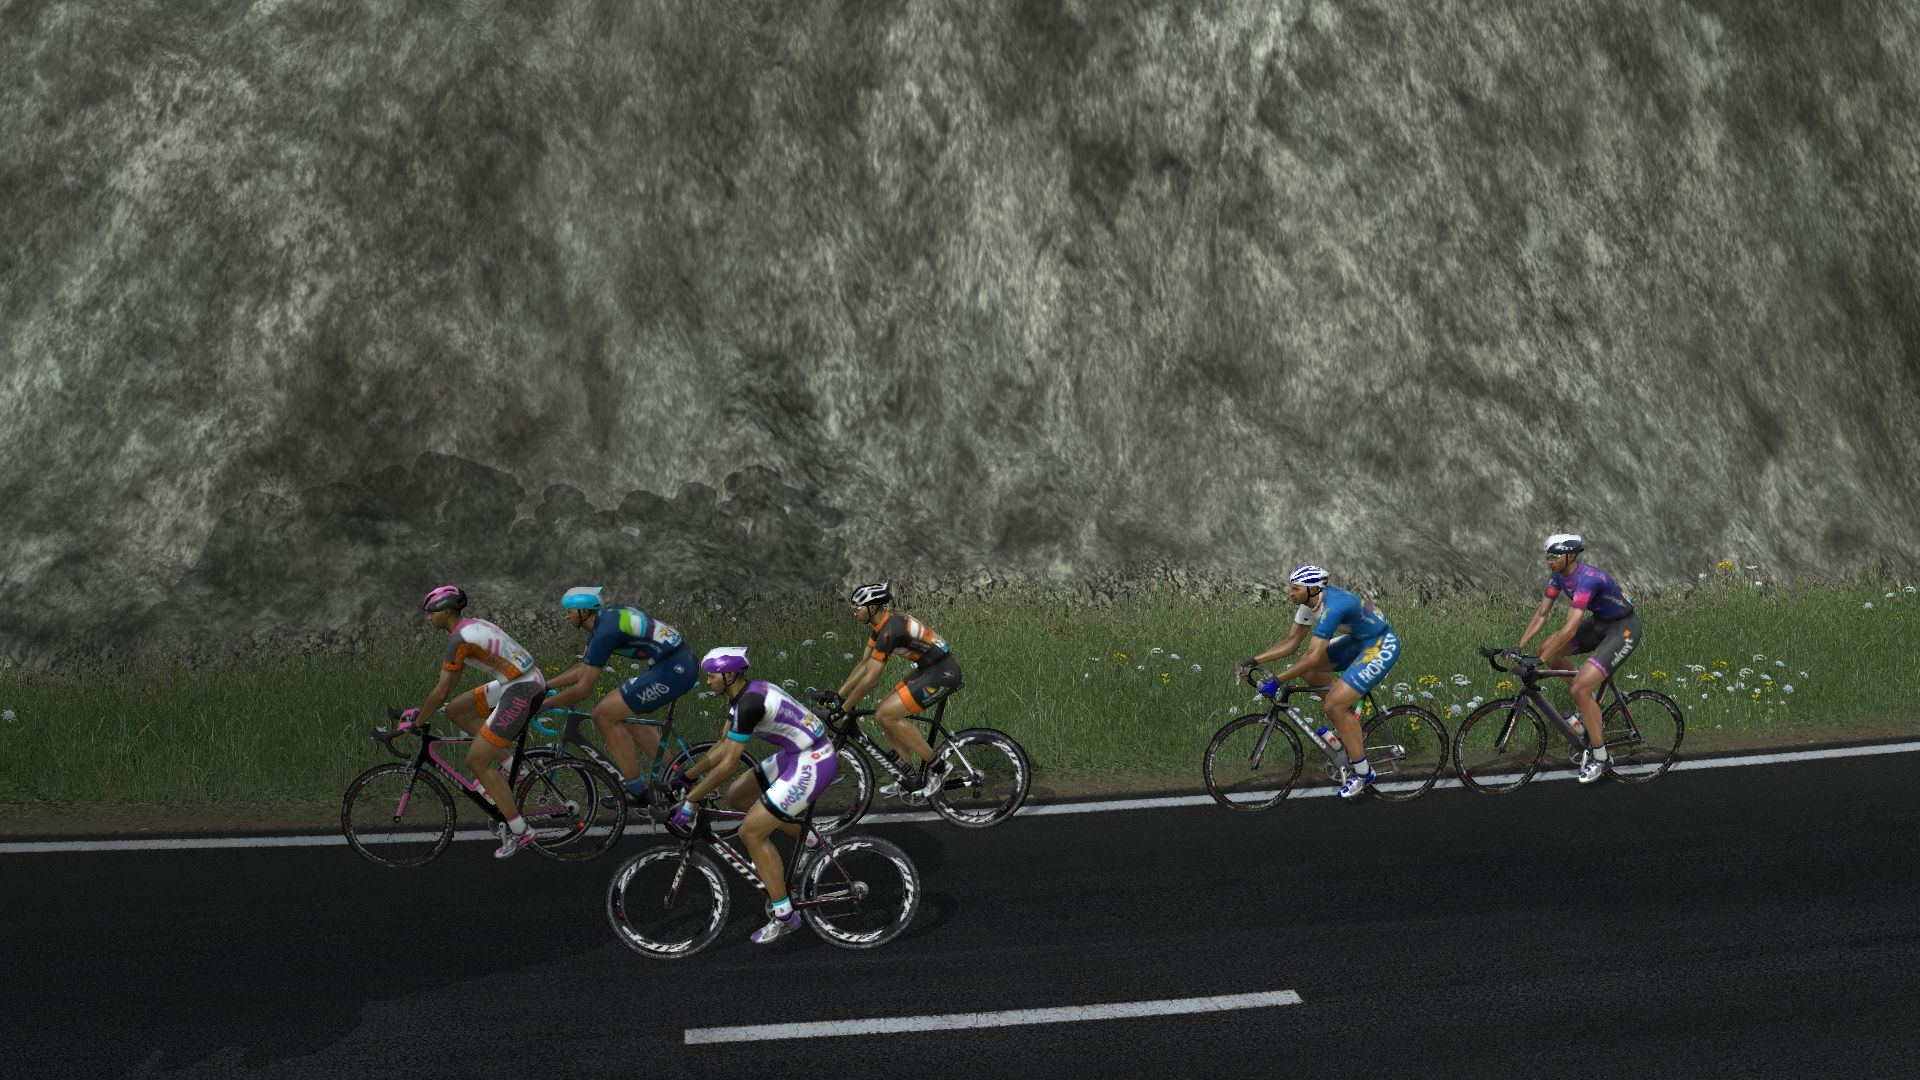 pcmdaily.com/images/mg/2017/Races/CT/Trentino/mg2017_trentino_03_PCM0037.jpg